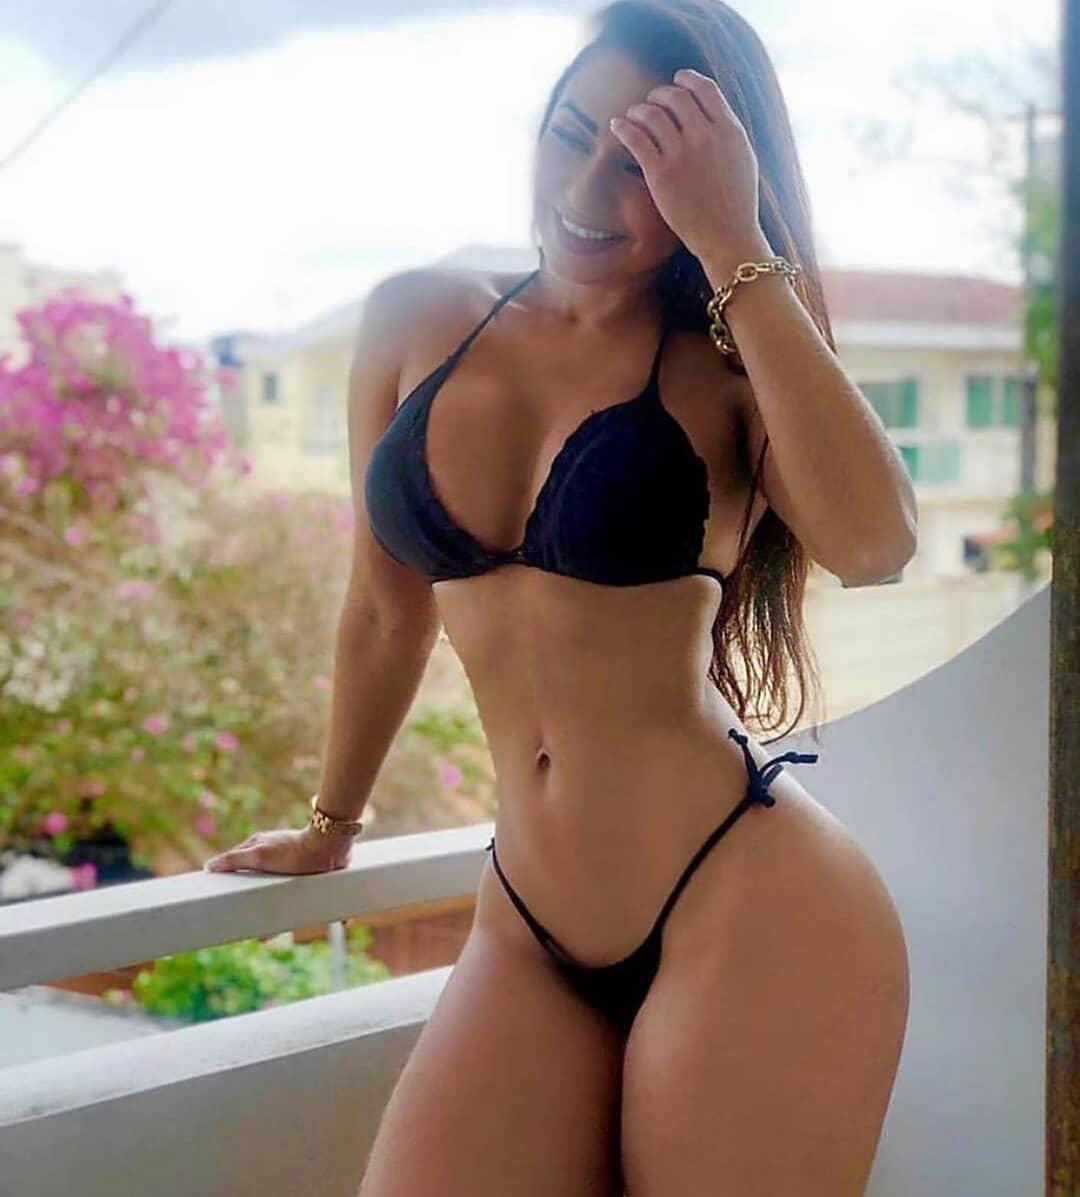 Beautiful Venezuelan Women self-fulfilling prophecy, as, from